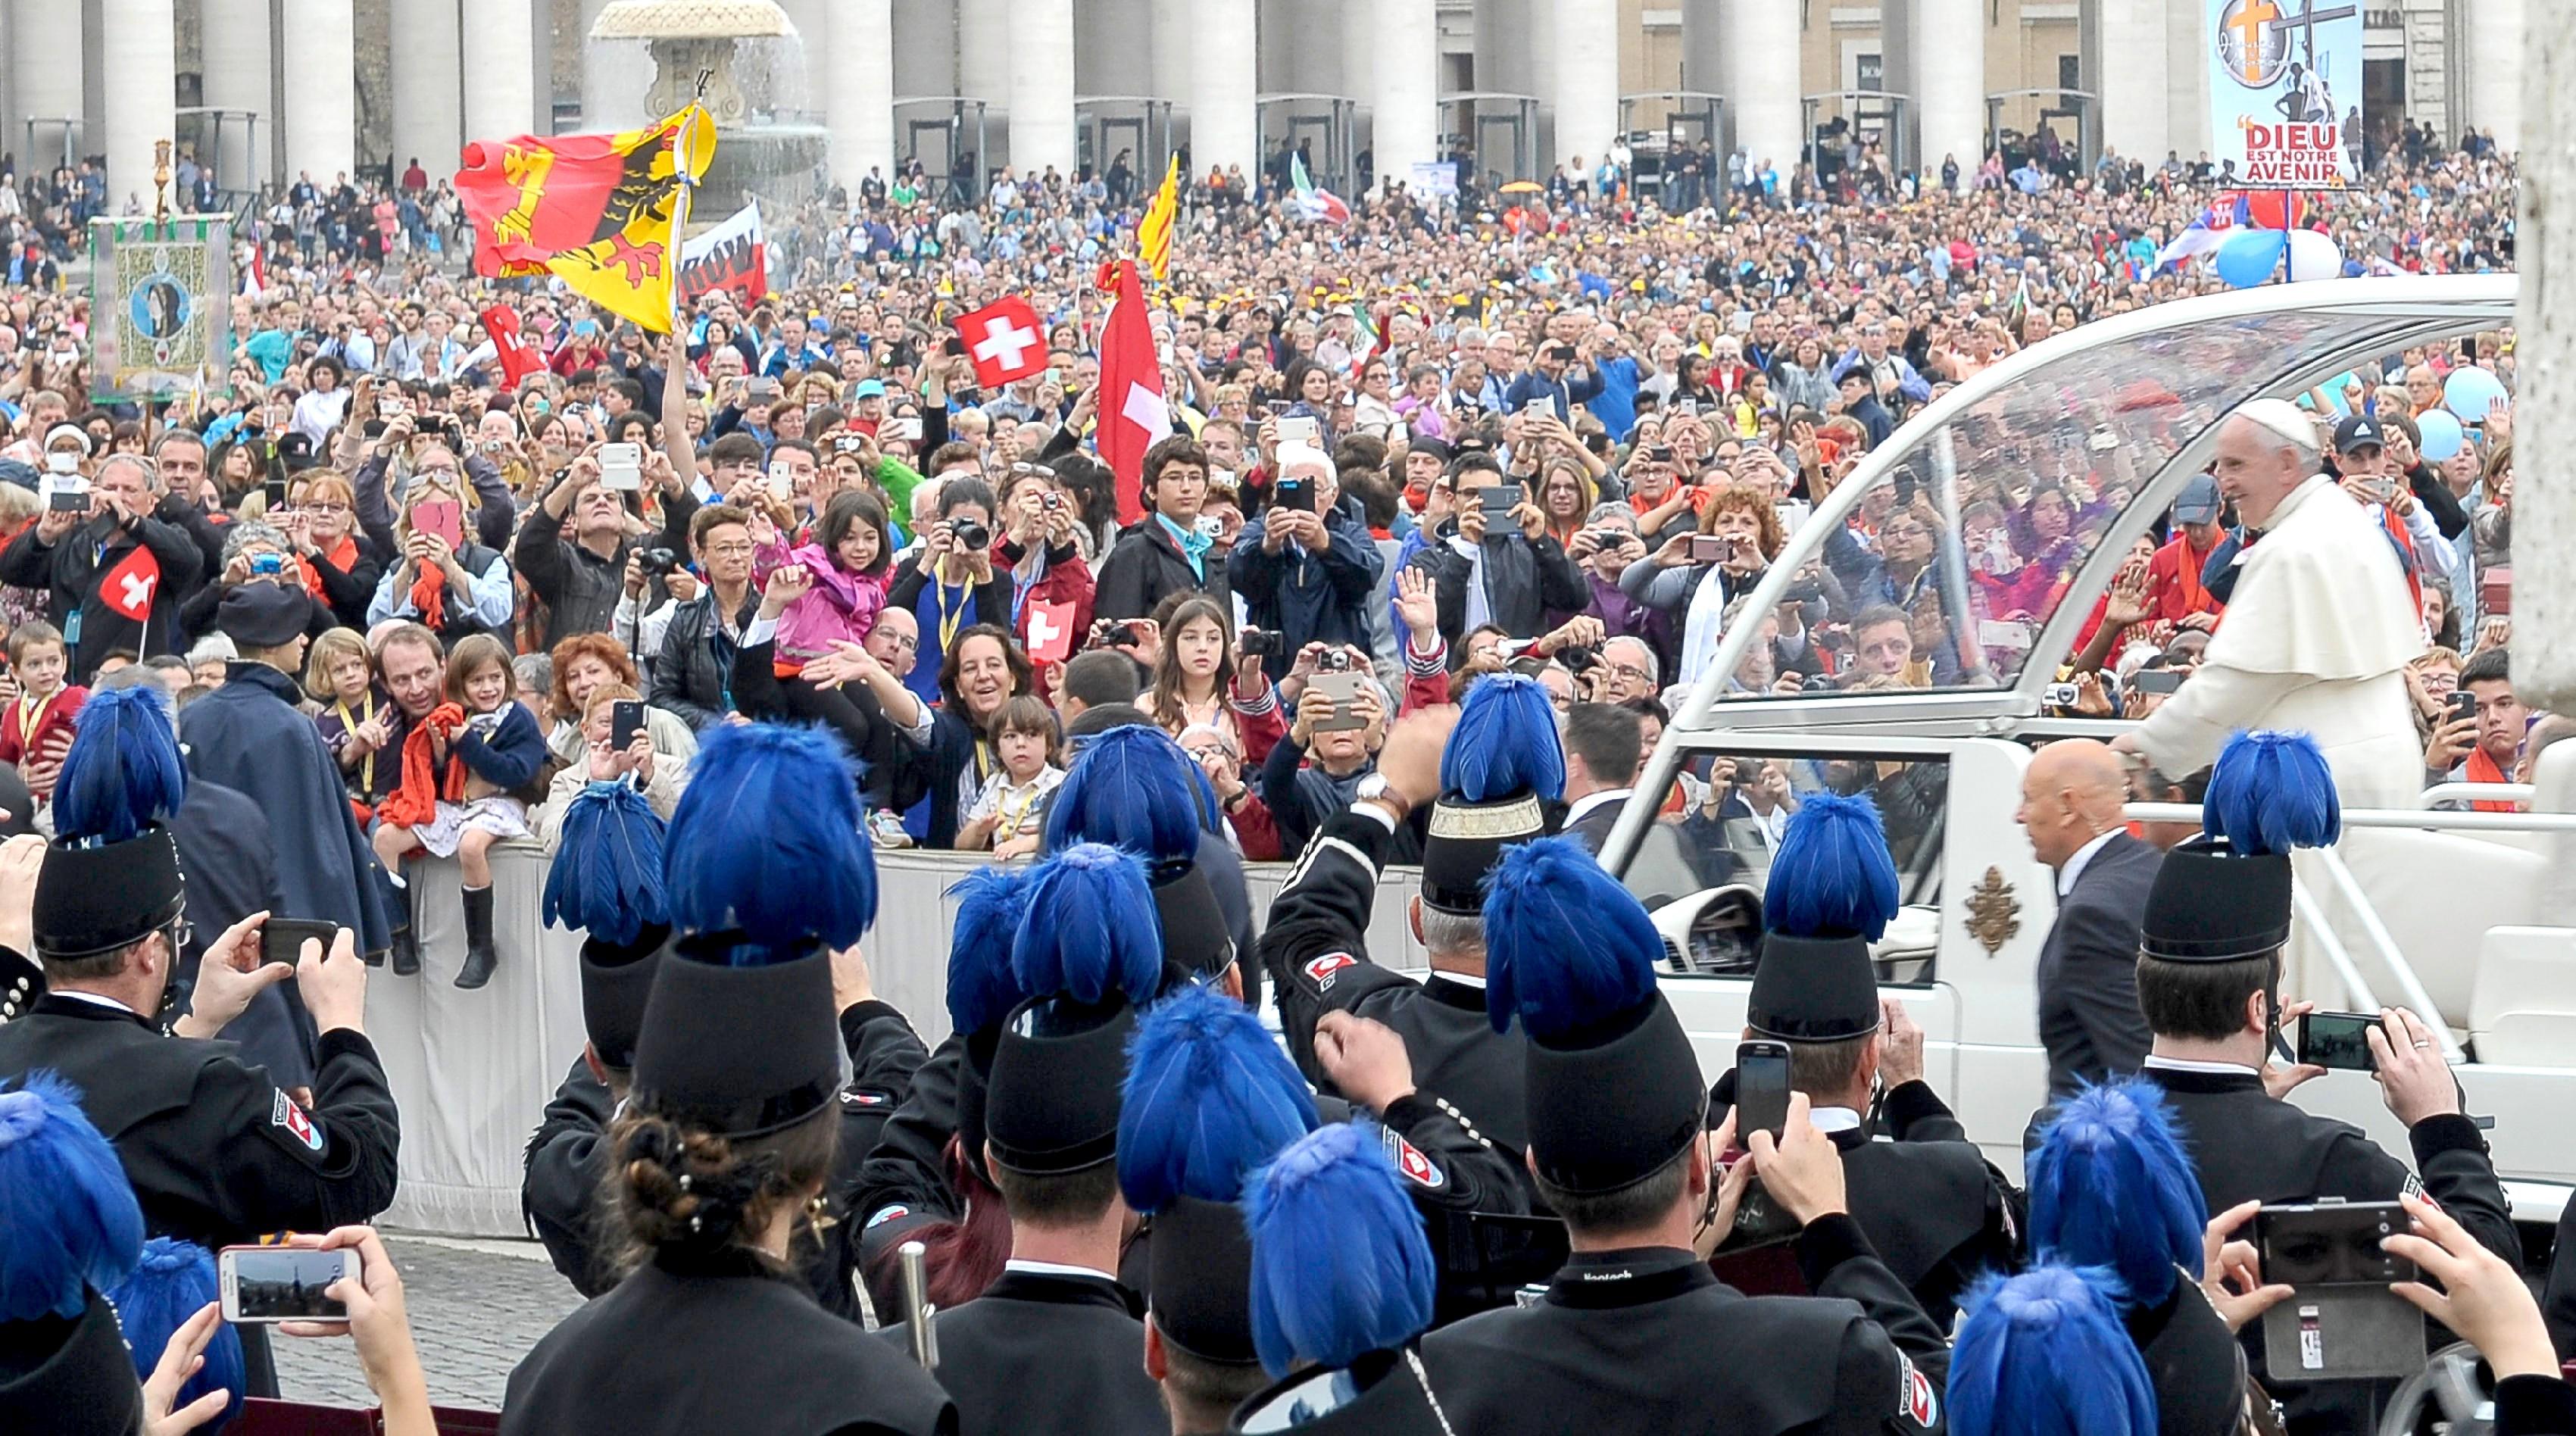 Audiencia de los miércoles (Foto Osservatore Romano©)